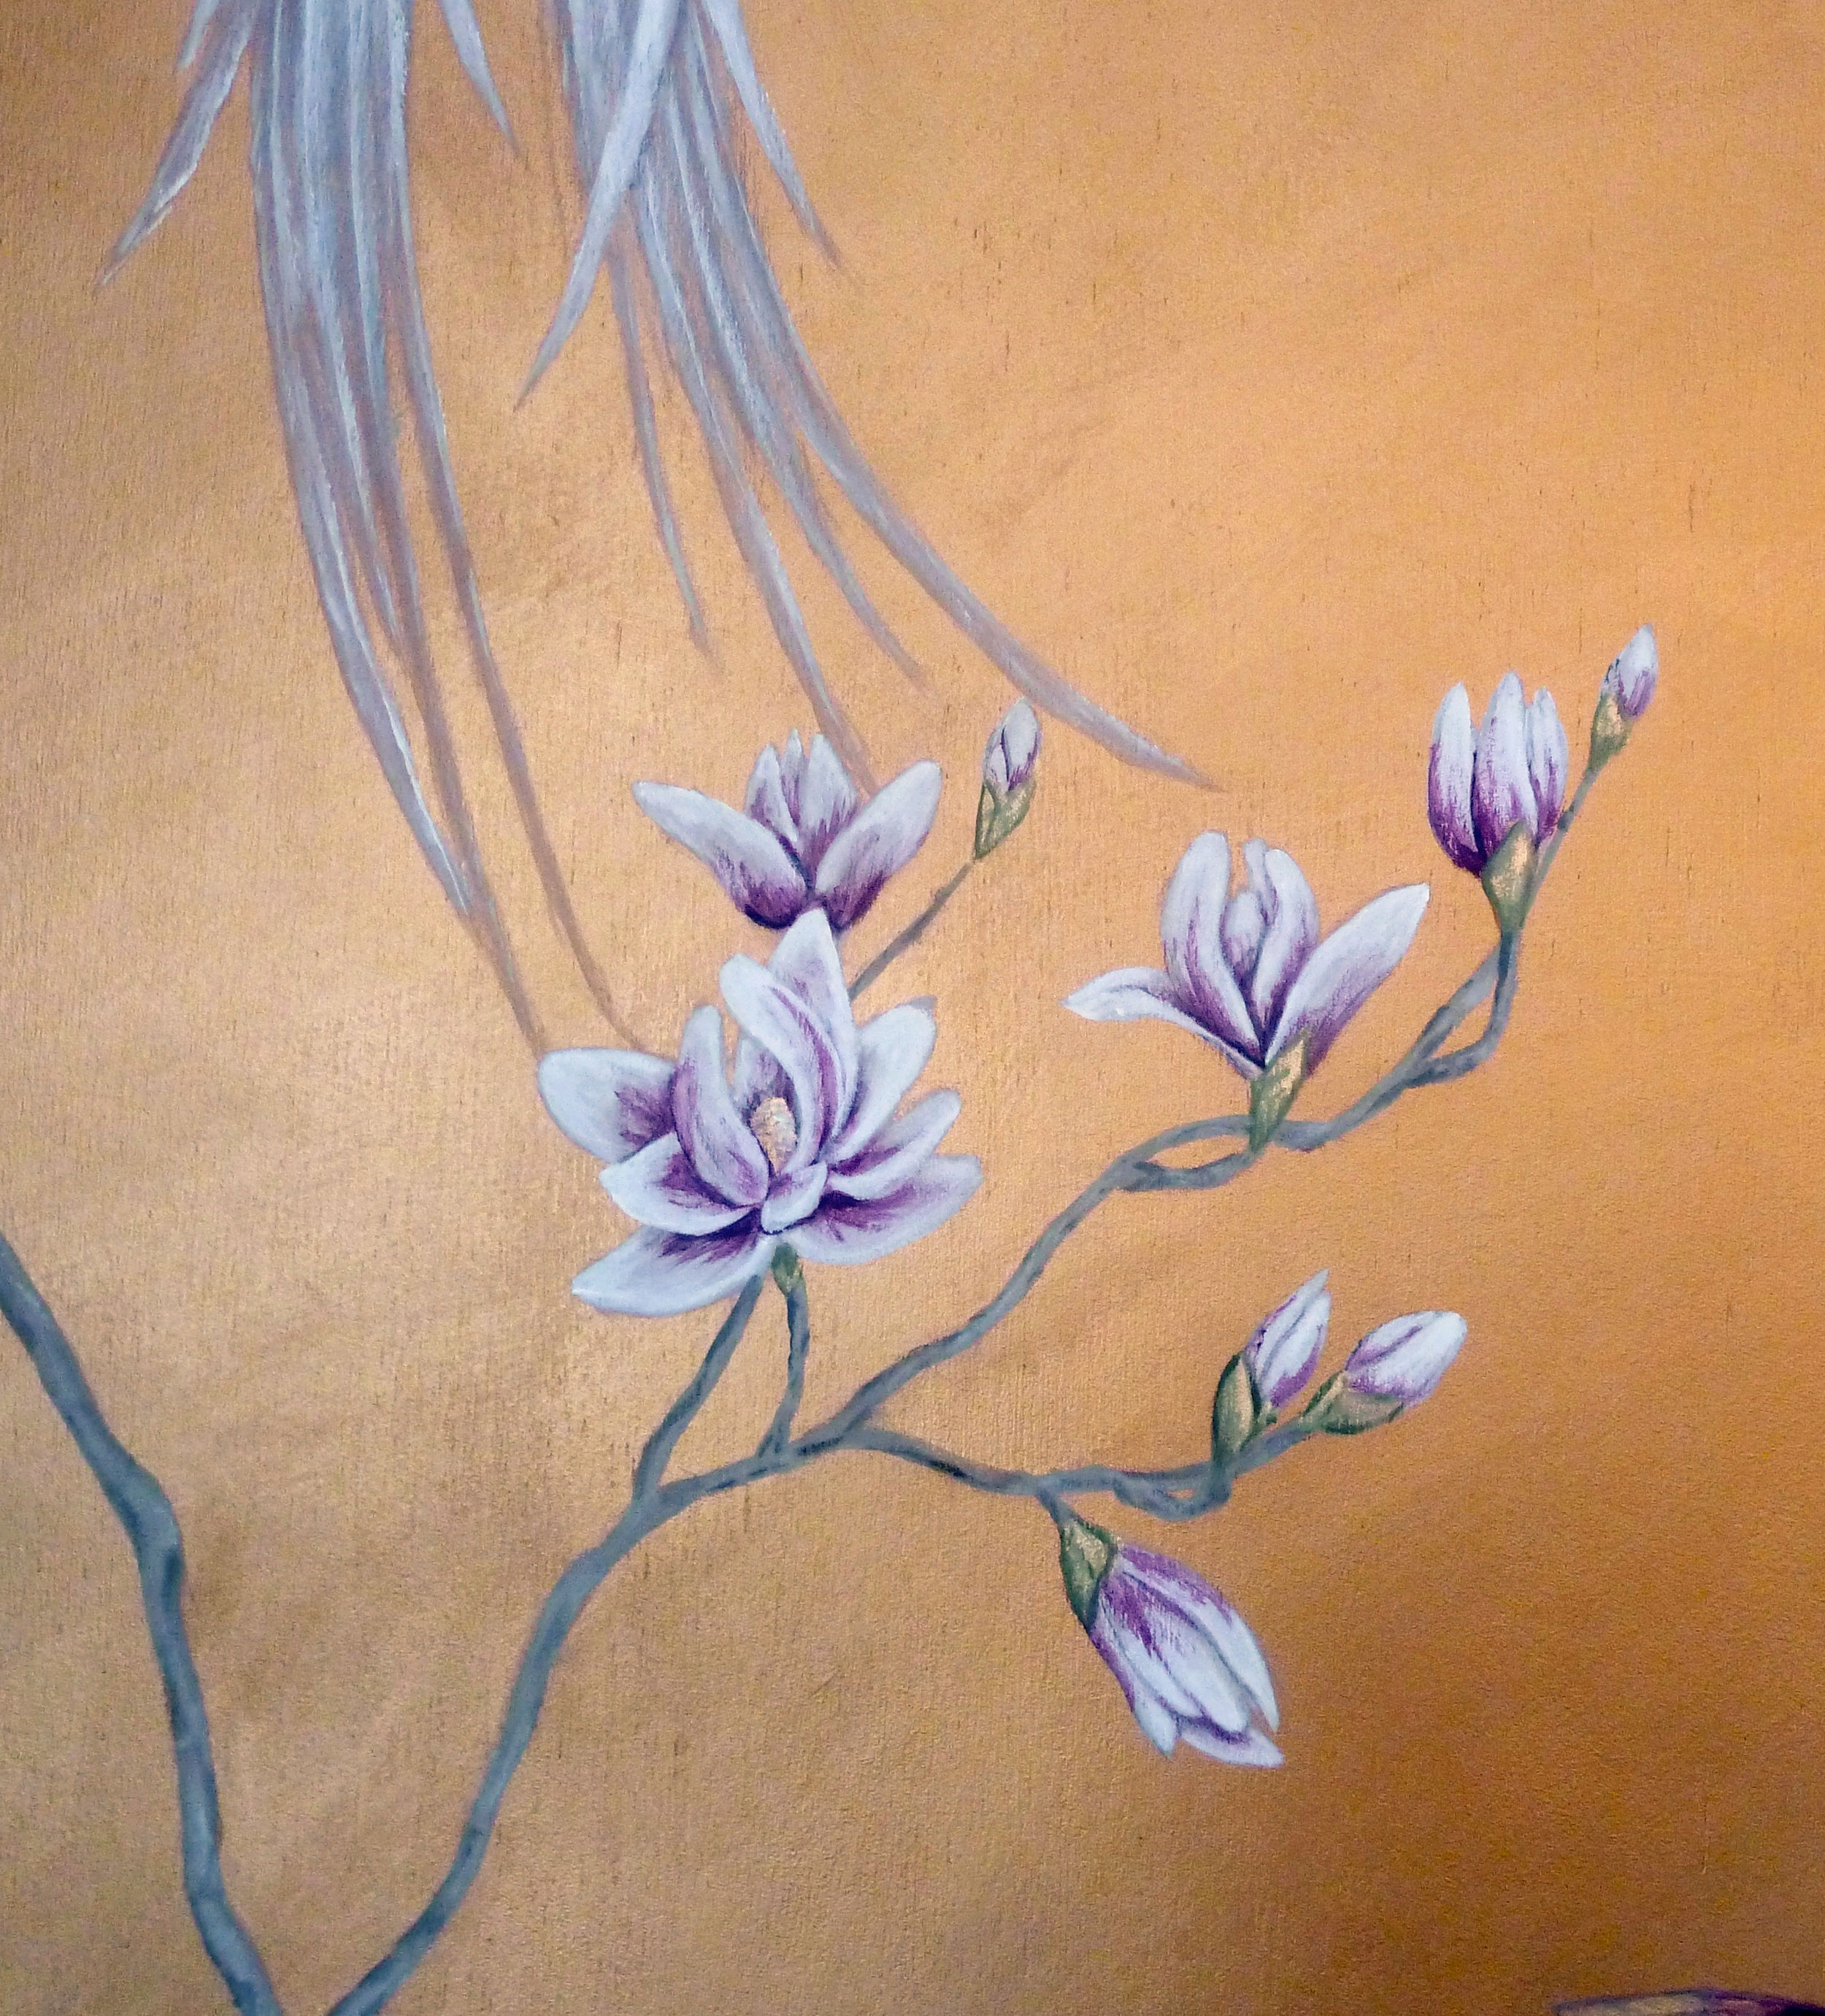 Magnolia chinoiserie wall mural, detail